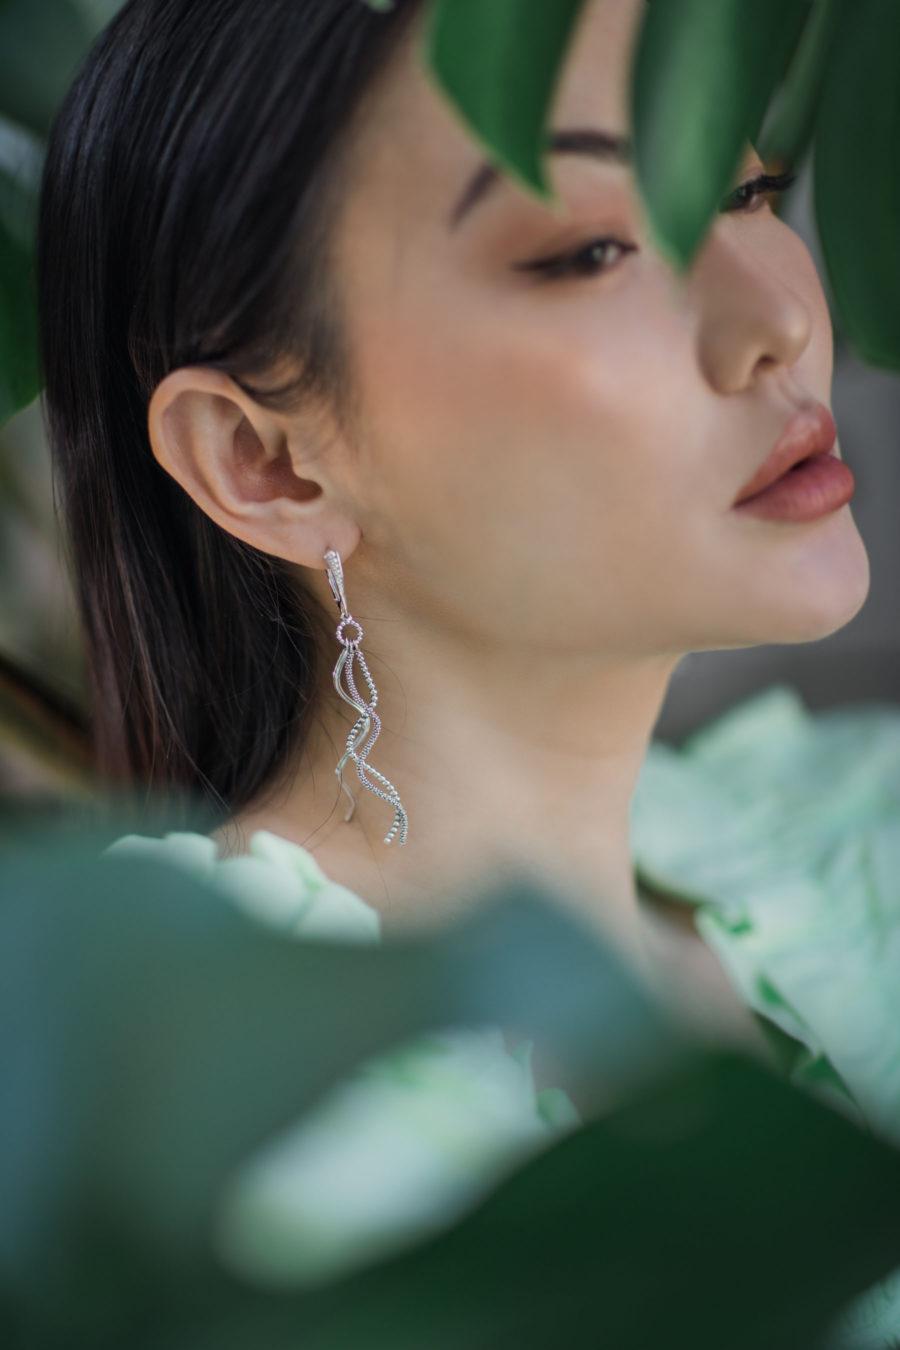 jessica wang wearing fine jewelry by lagos jewelry brand // Jessica Wang - Notjessfashion.com